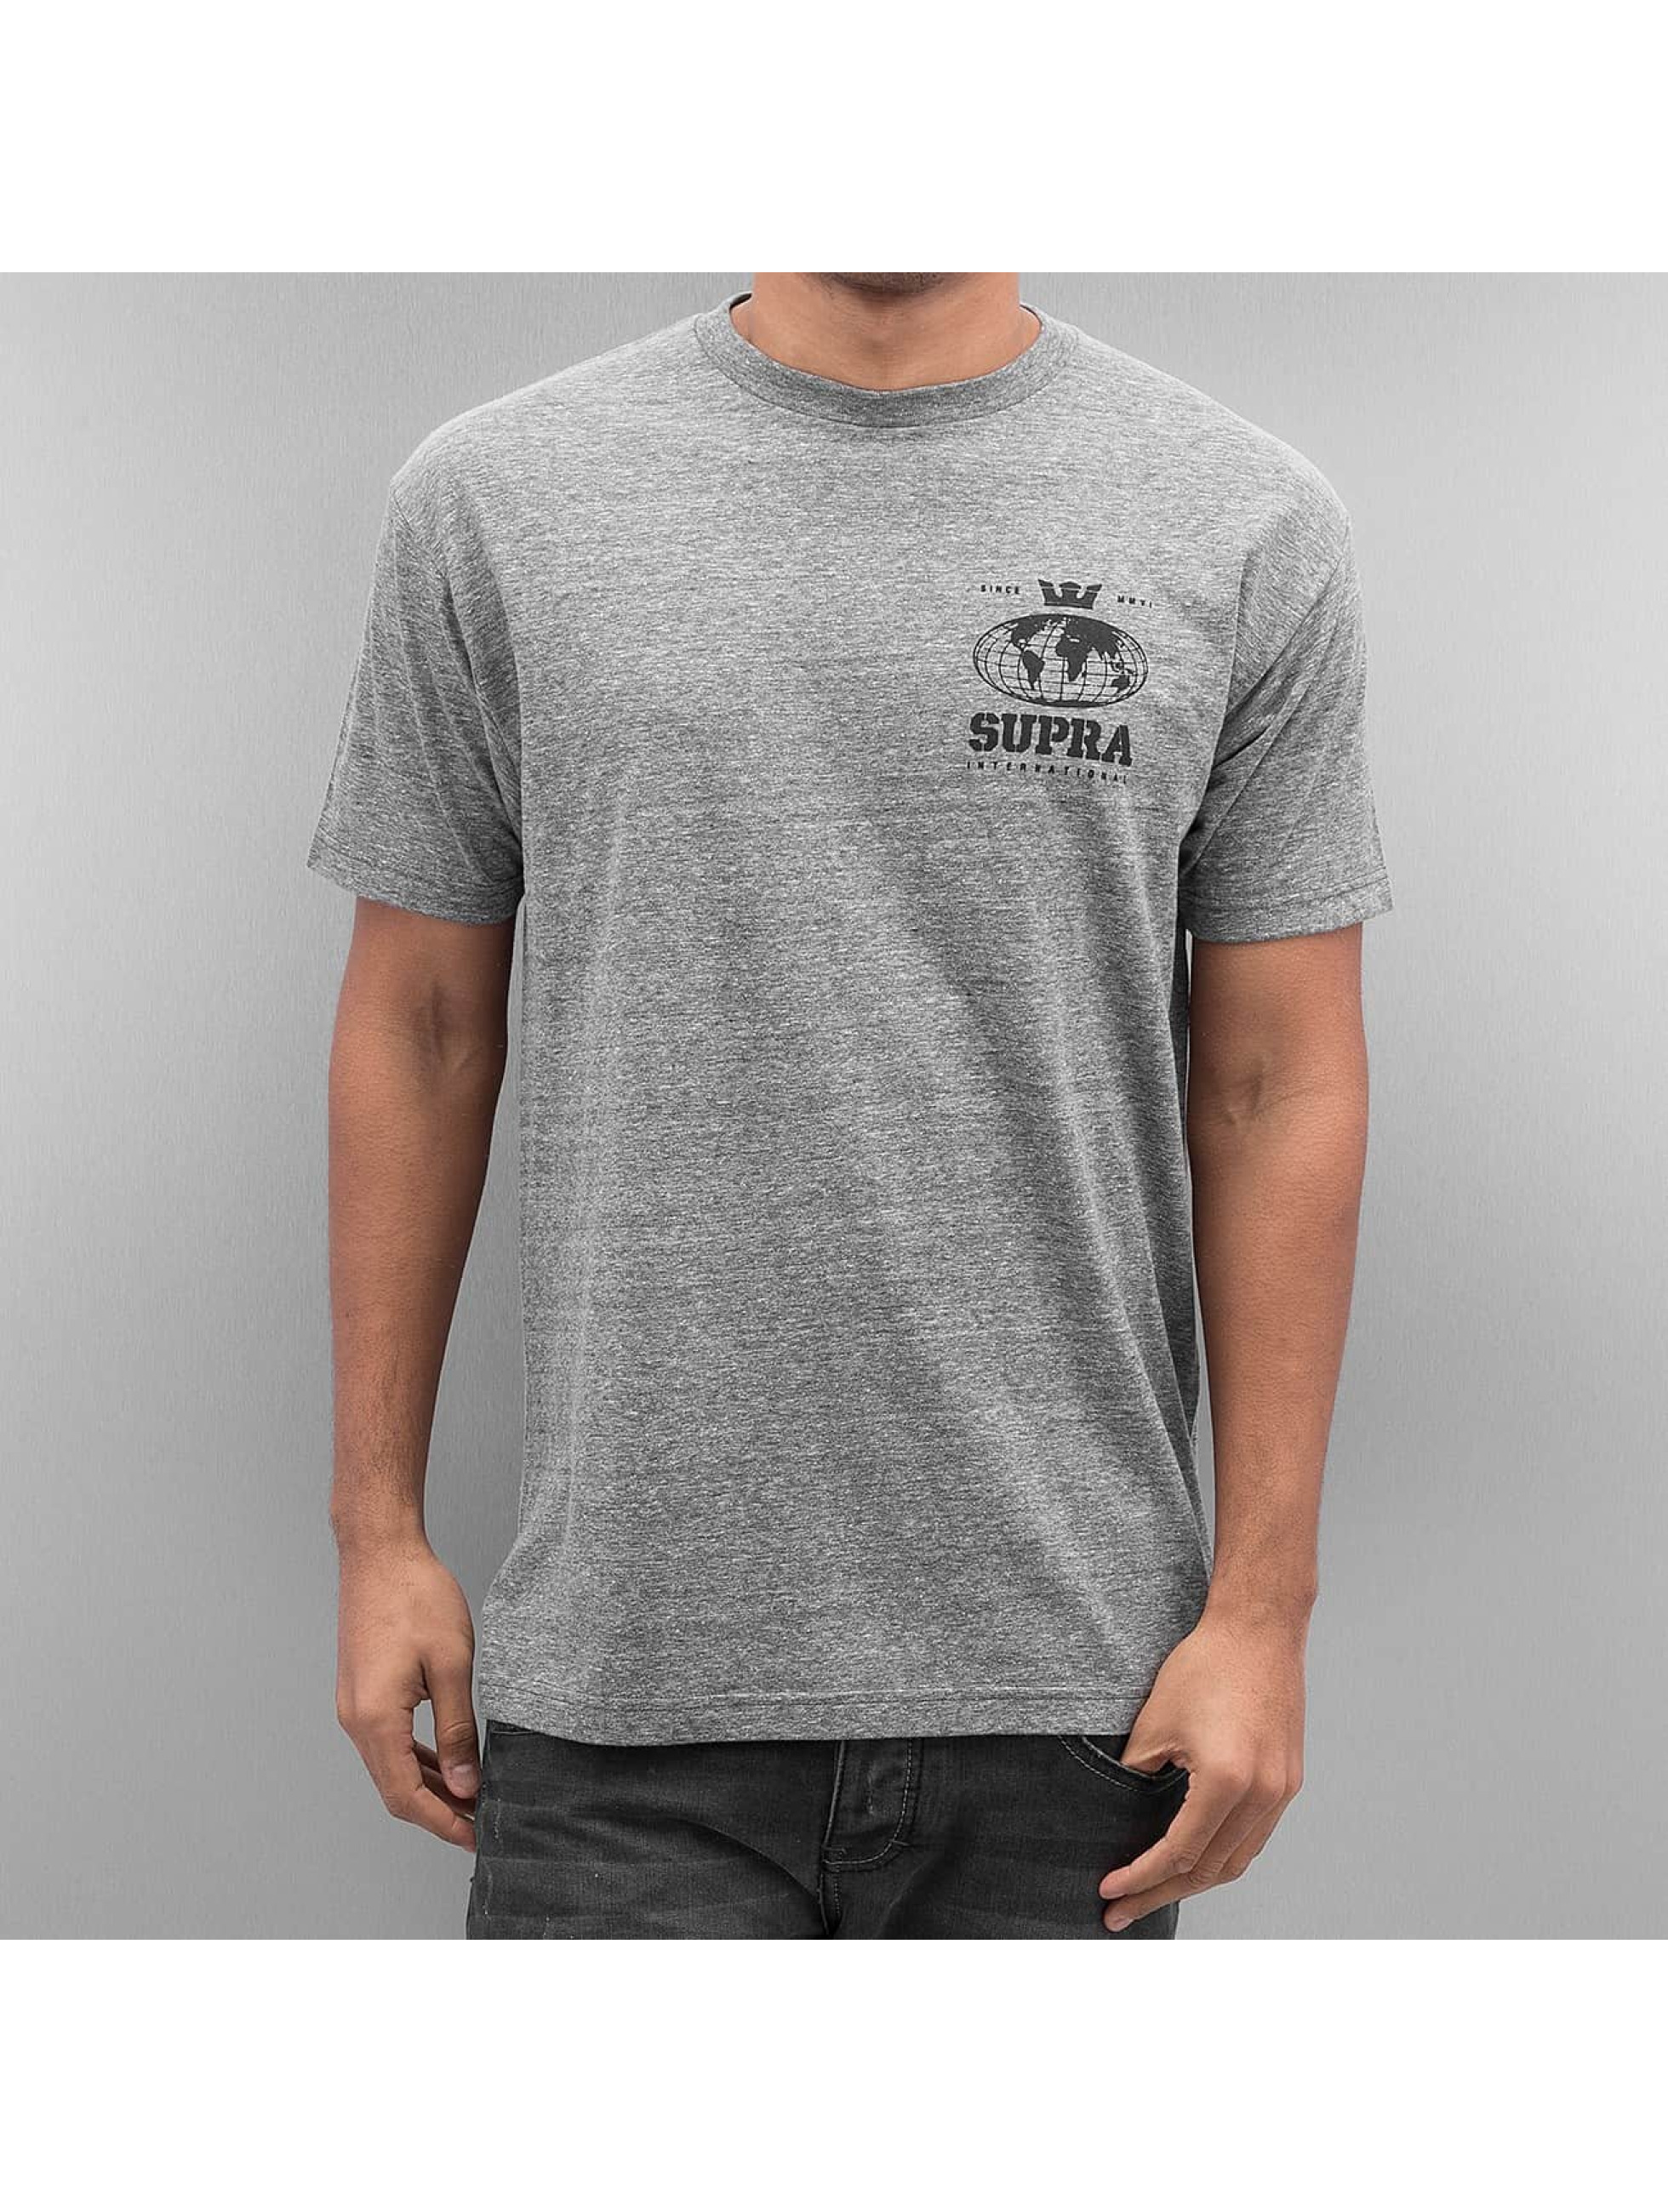 Supra Worldwide Reg T Shirt Grey Heather